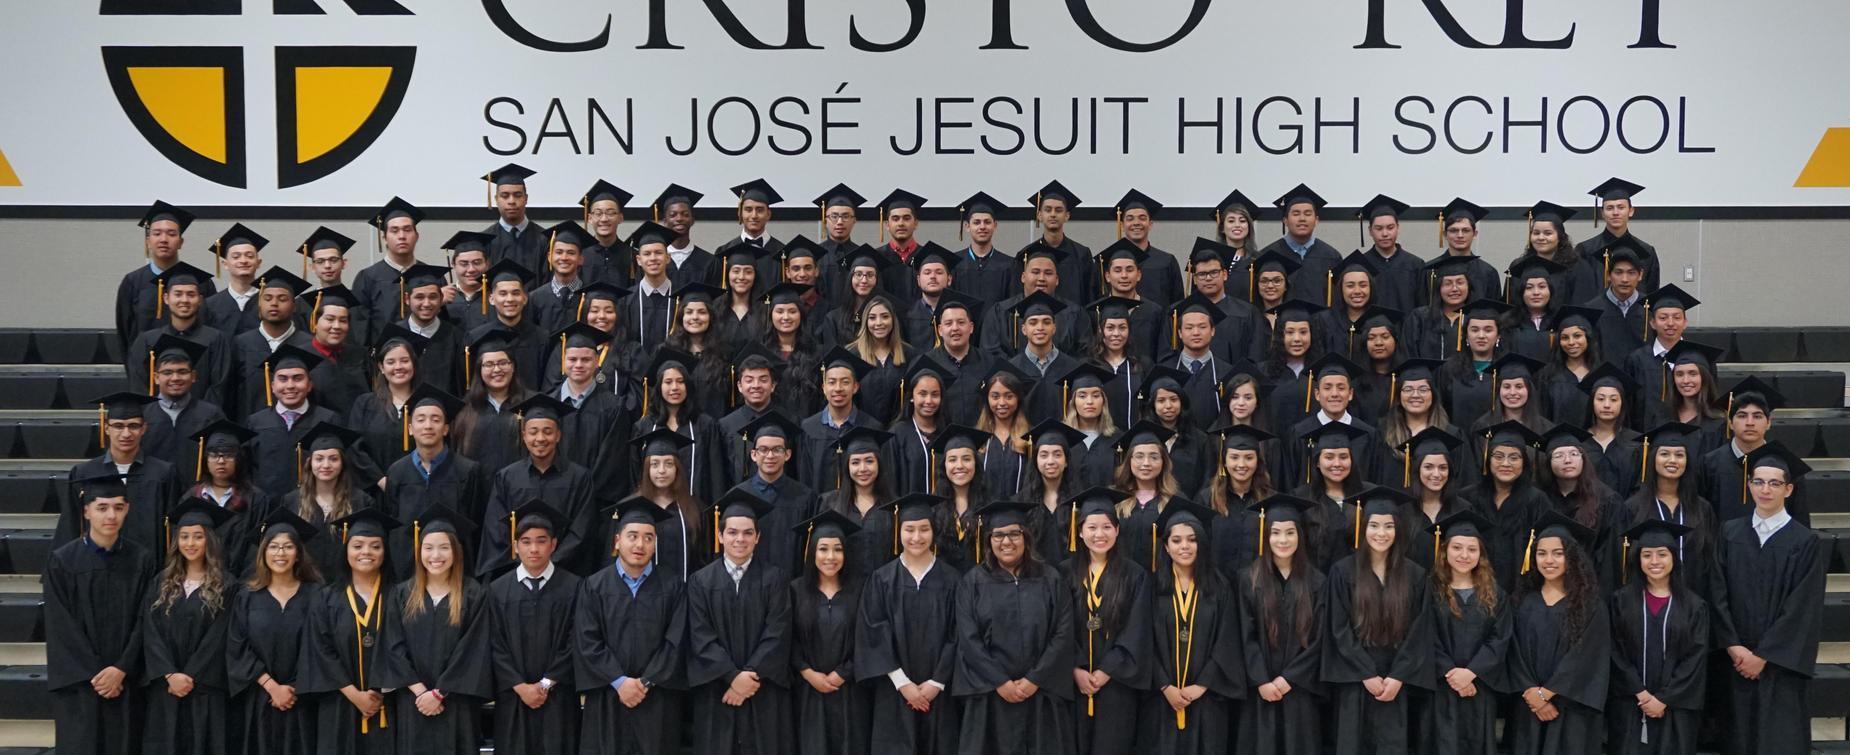 Cristo Rey San Jose Jesuit High School